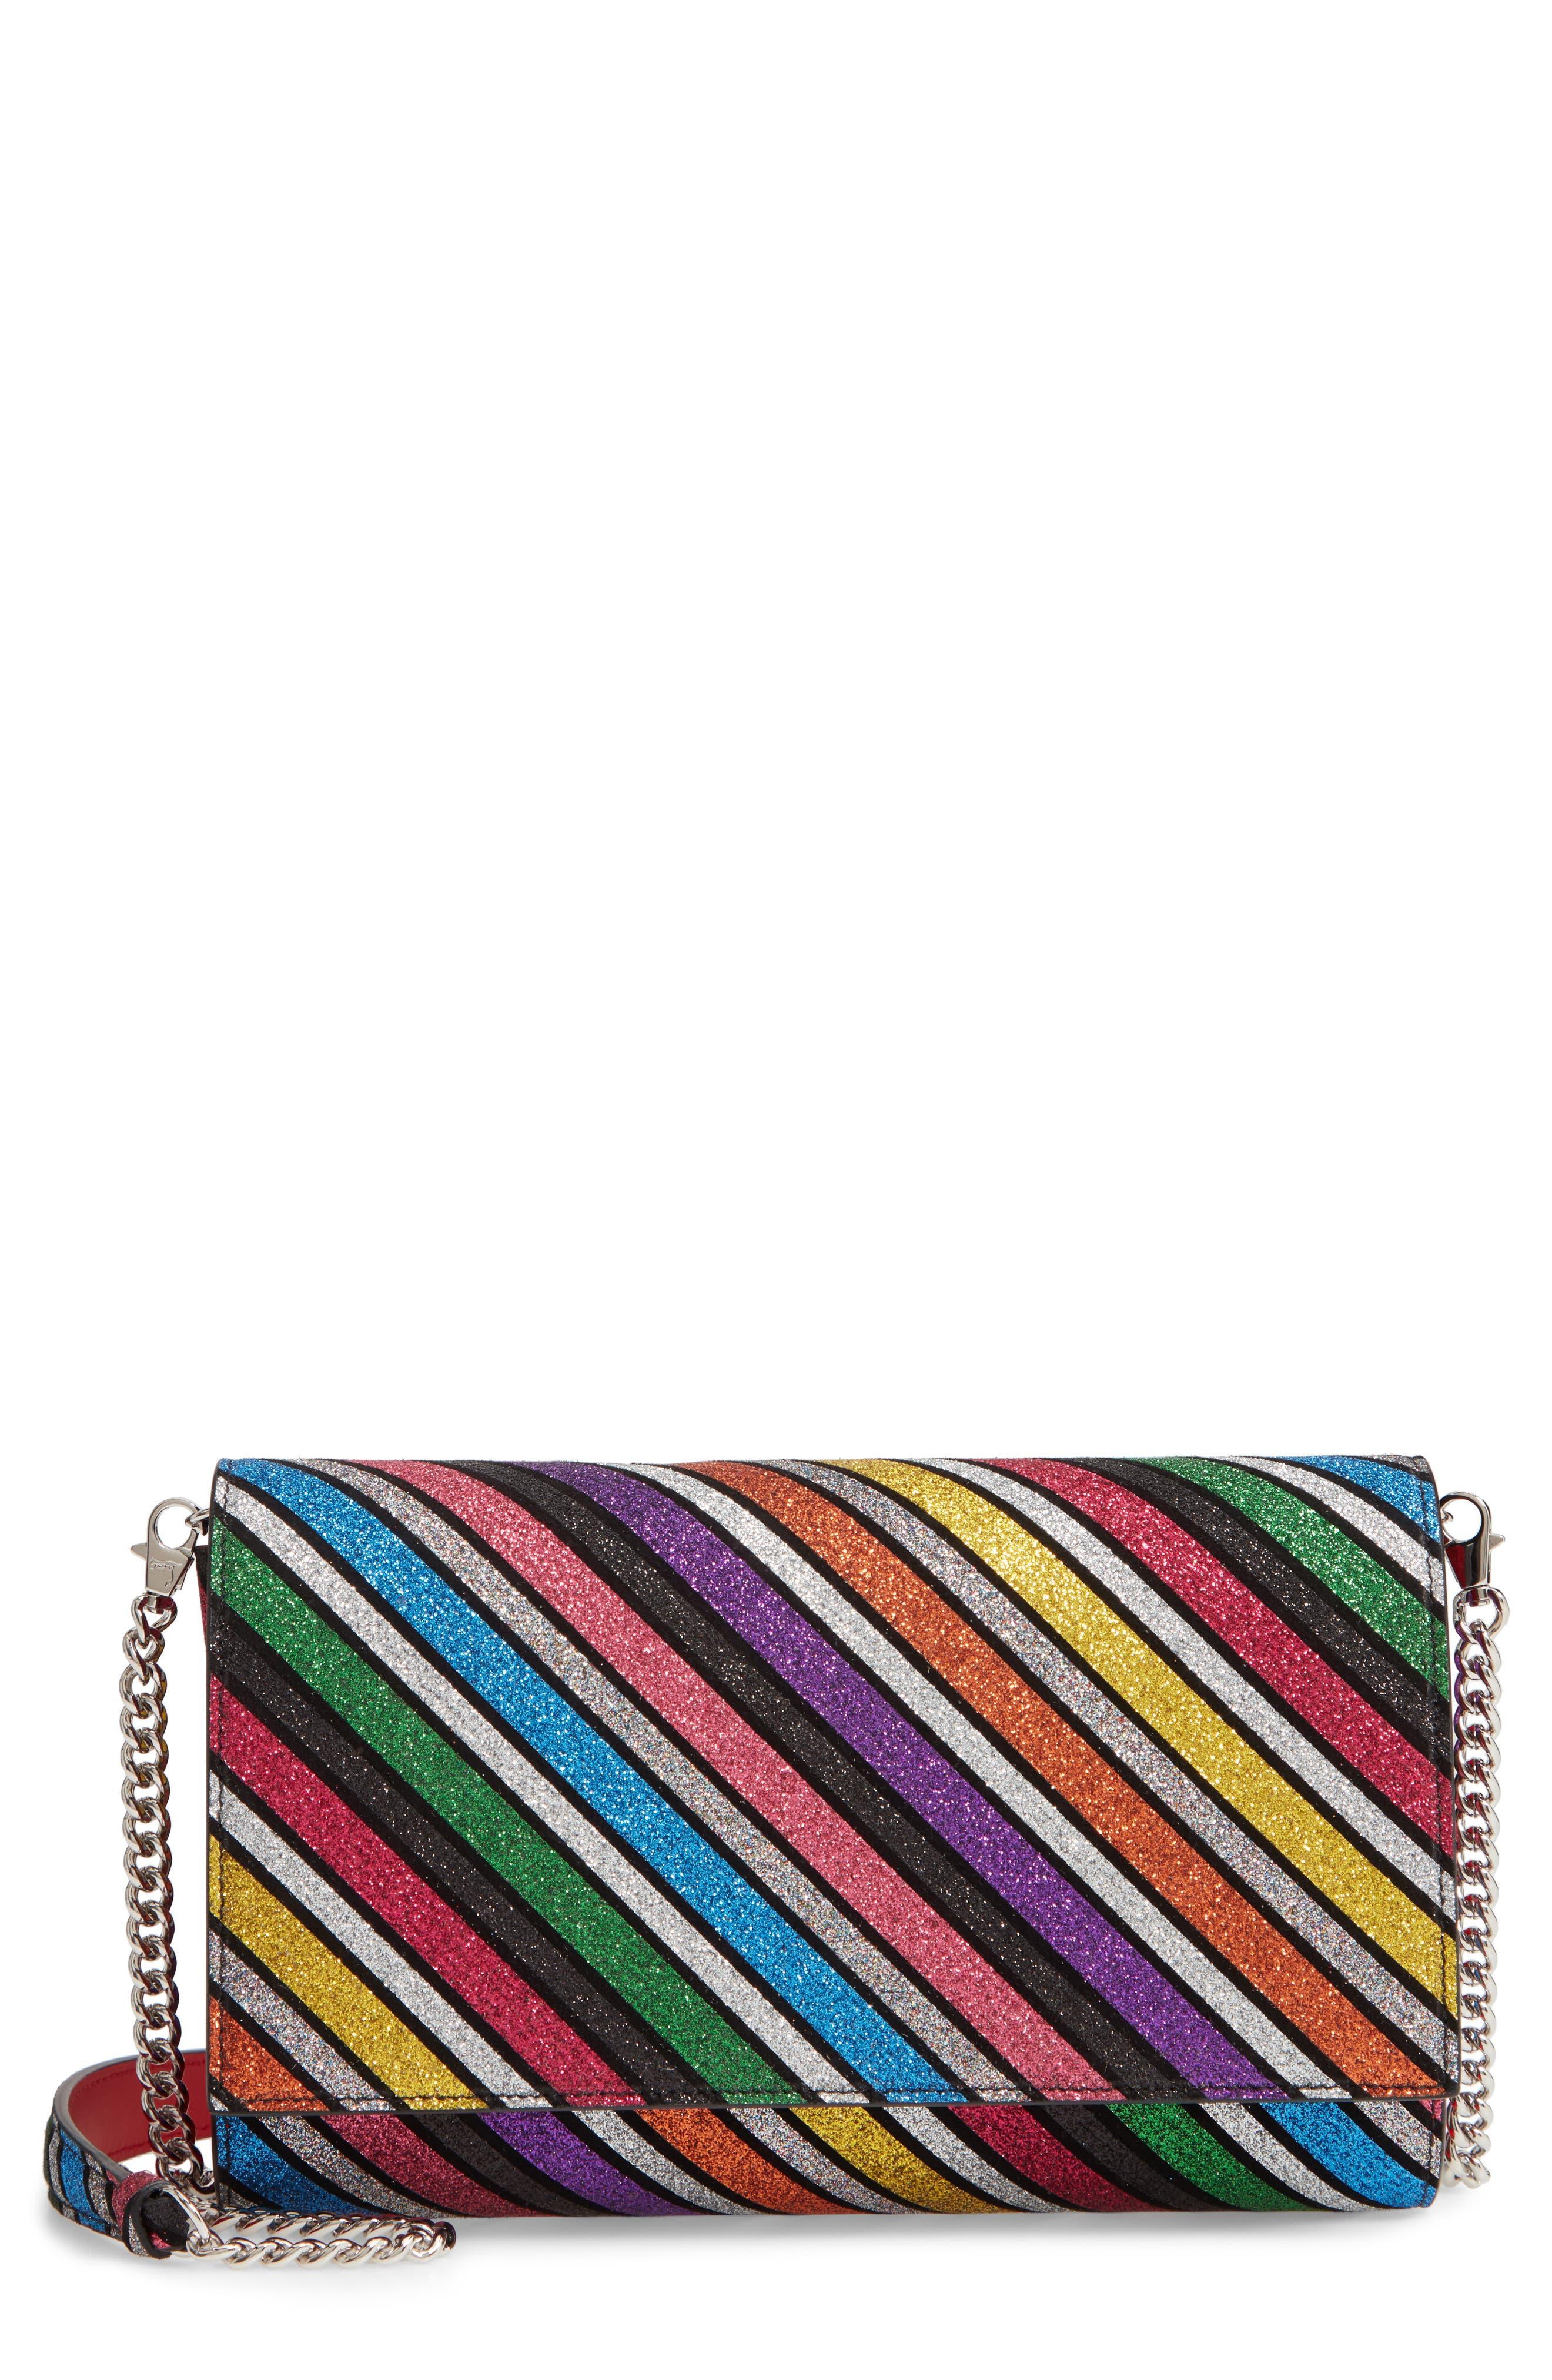 CHRISTIAN LOUBOUTIN Paloma Glitter Rainbow Suede Clutch, Main, color, 040